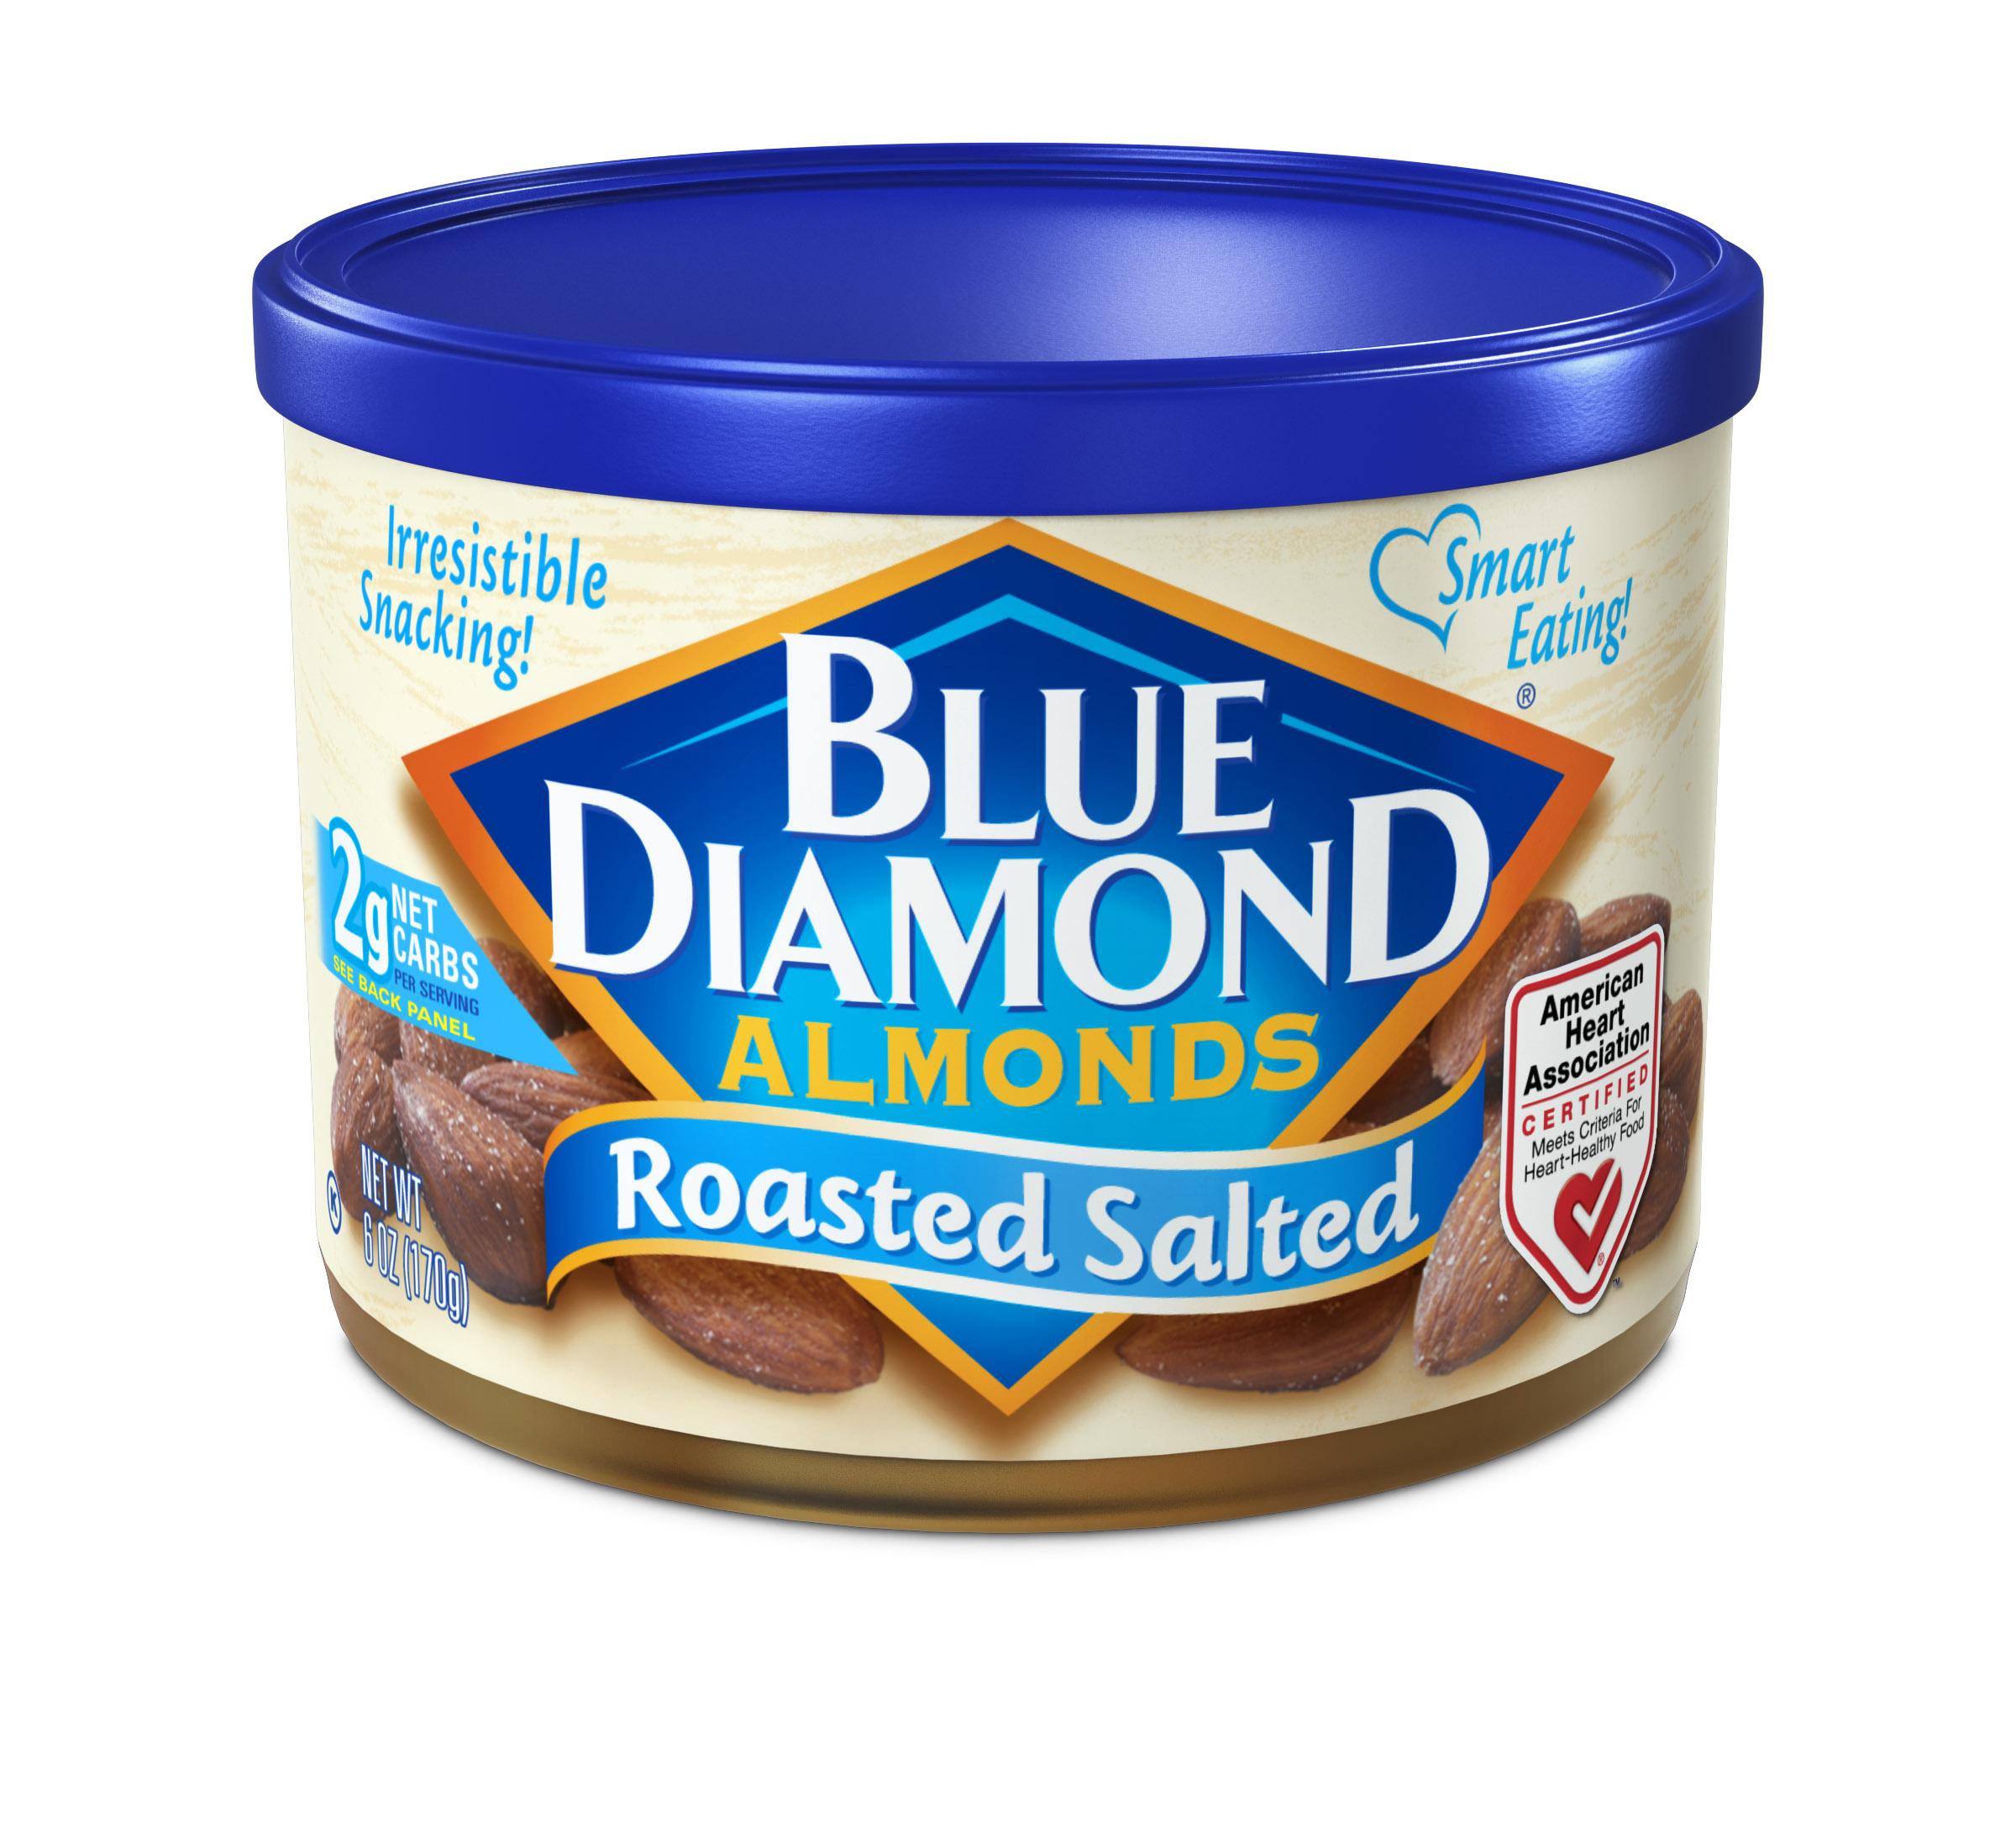 walgreens  blue diamond almonds only  1 11